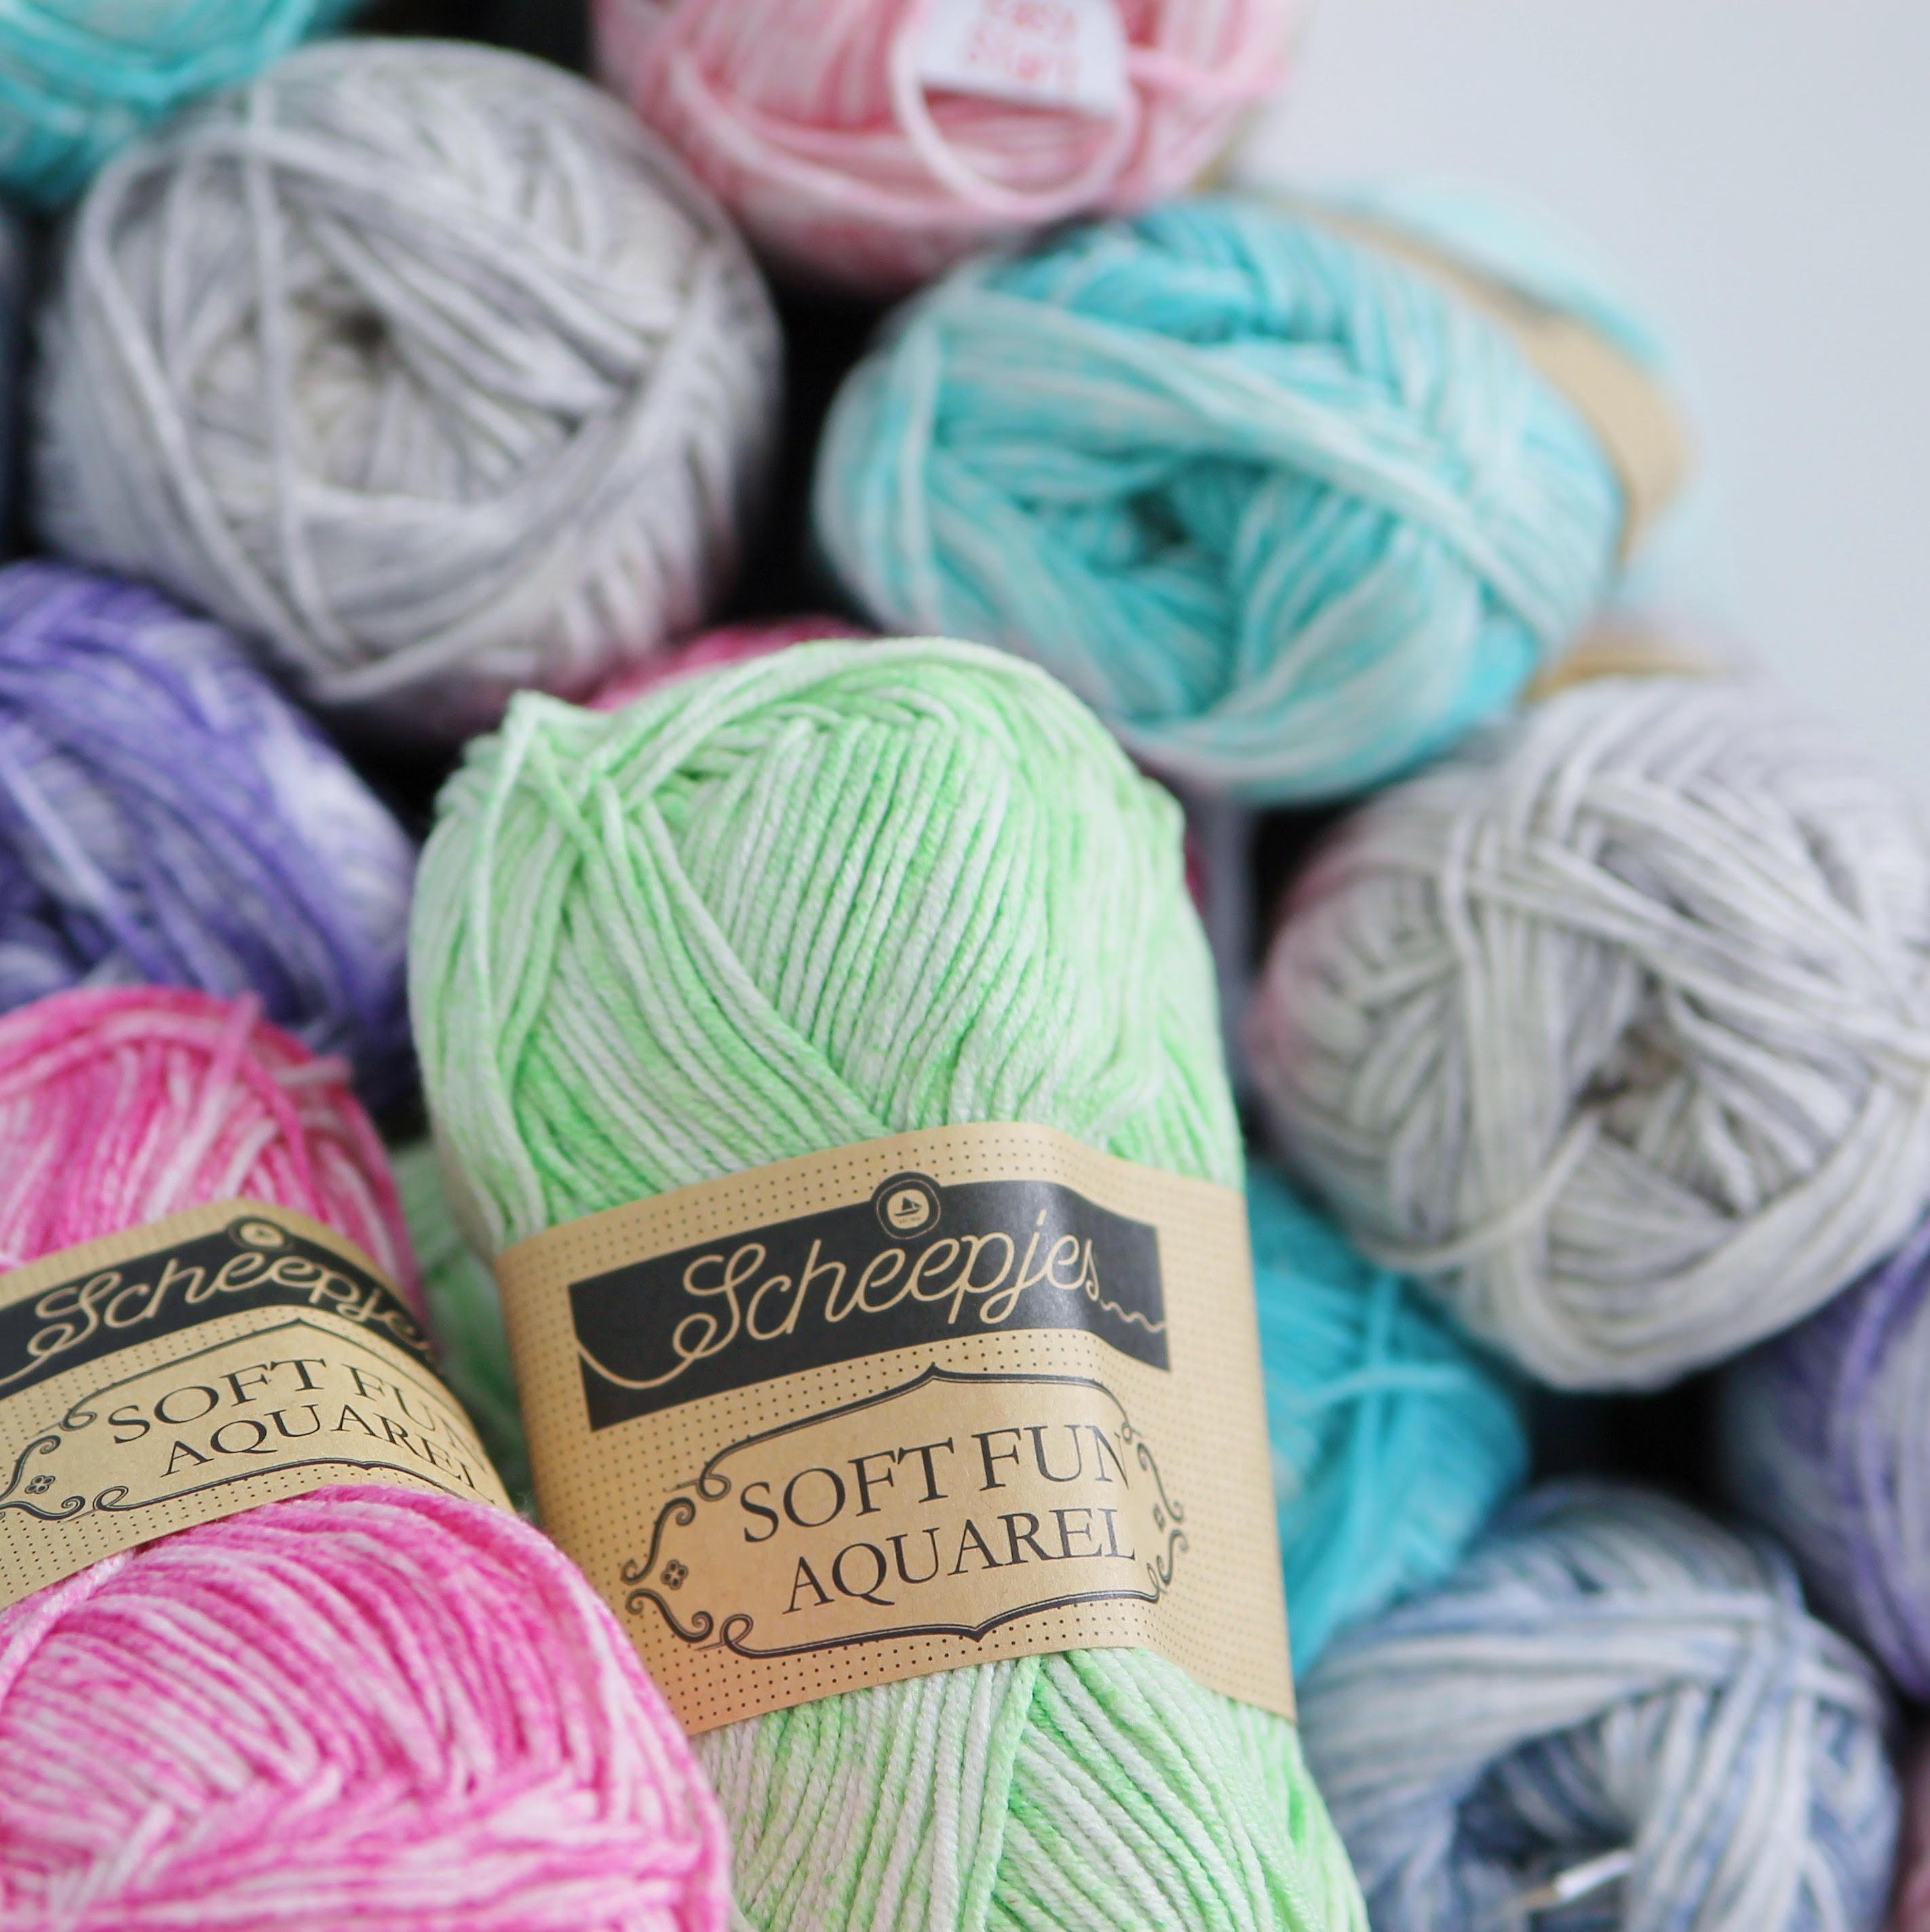 Scheepjes Softfun Aquarel, available from Wool Warehouse: http://shrsl.com/?dhnl